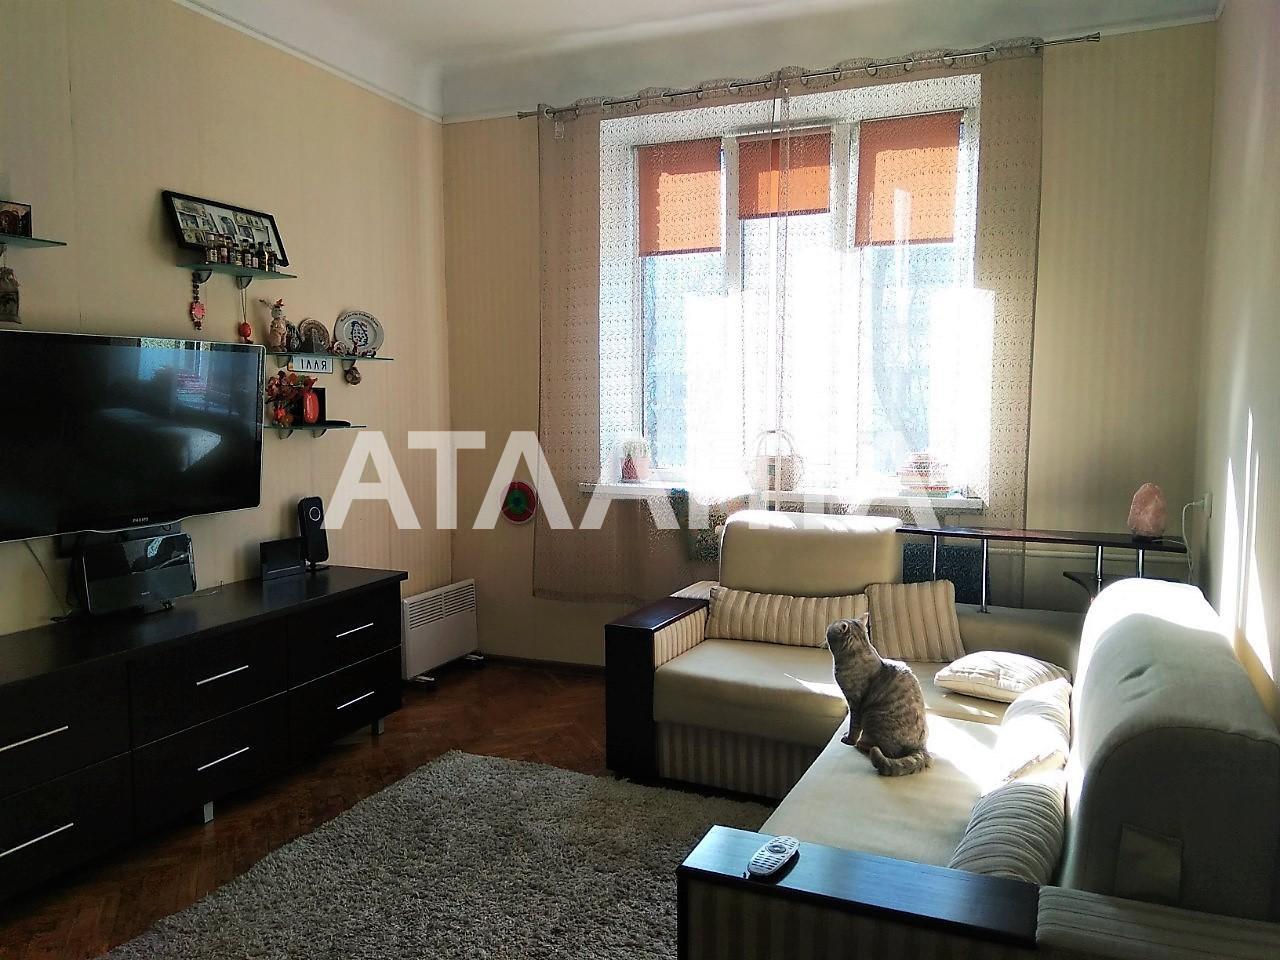 Продается 3-комнатная Квартира на ул. Ул. Семьи Хохловых — 72 000 у.е. (фото №8)